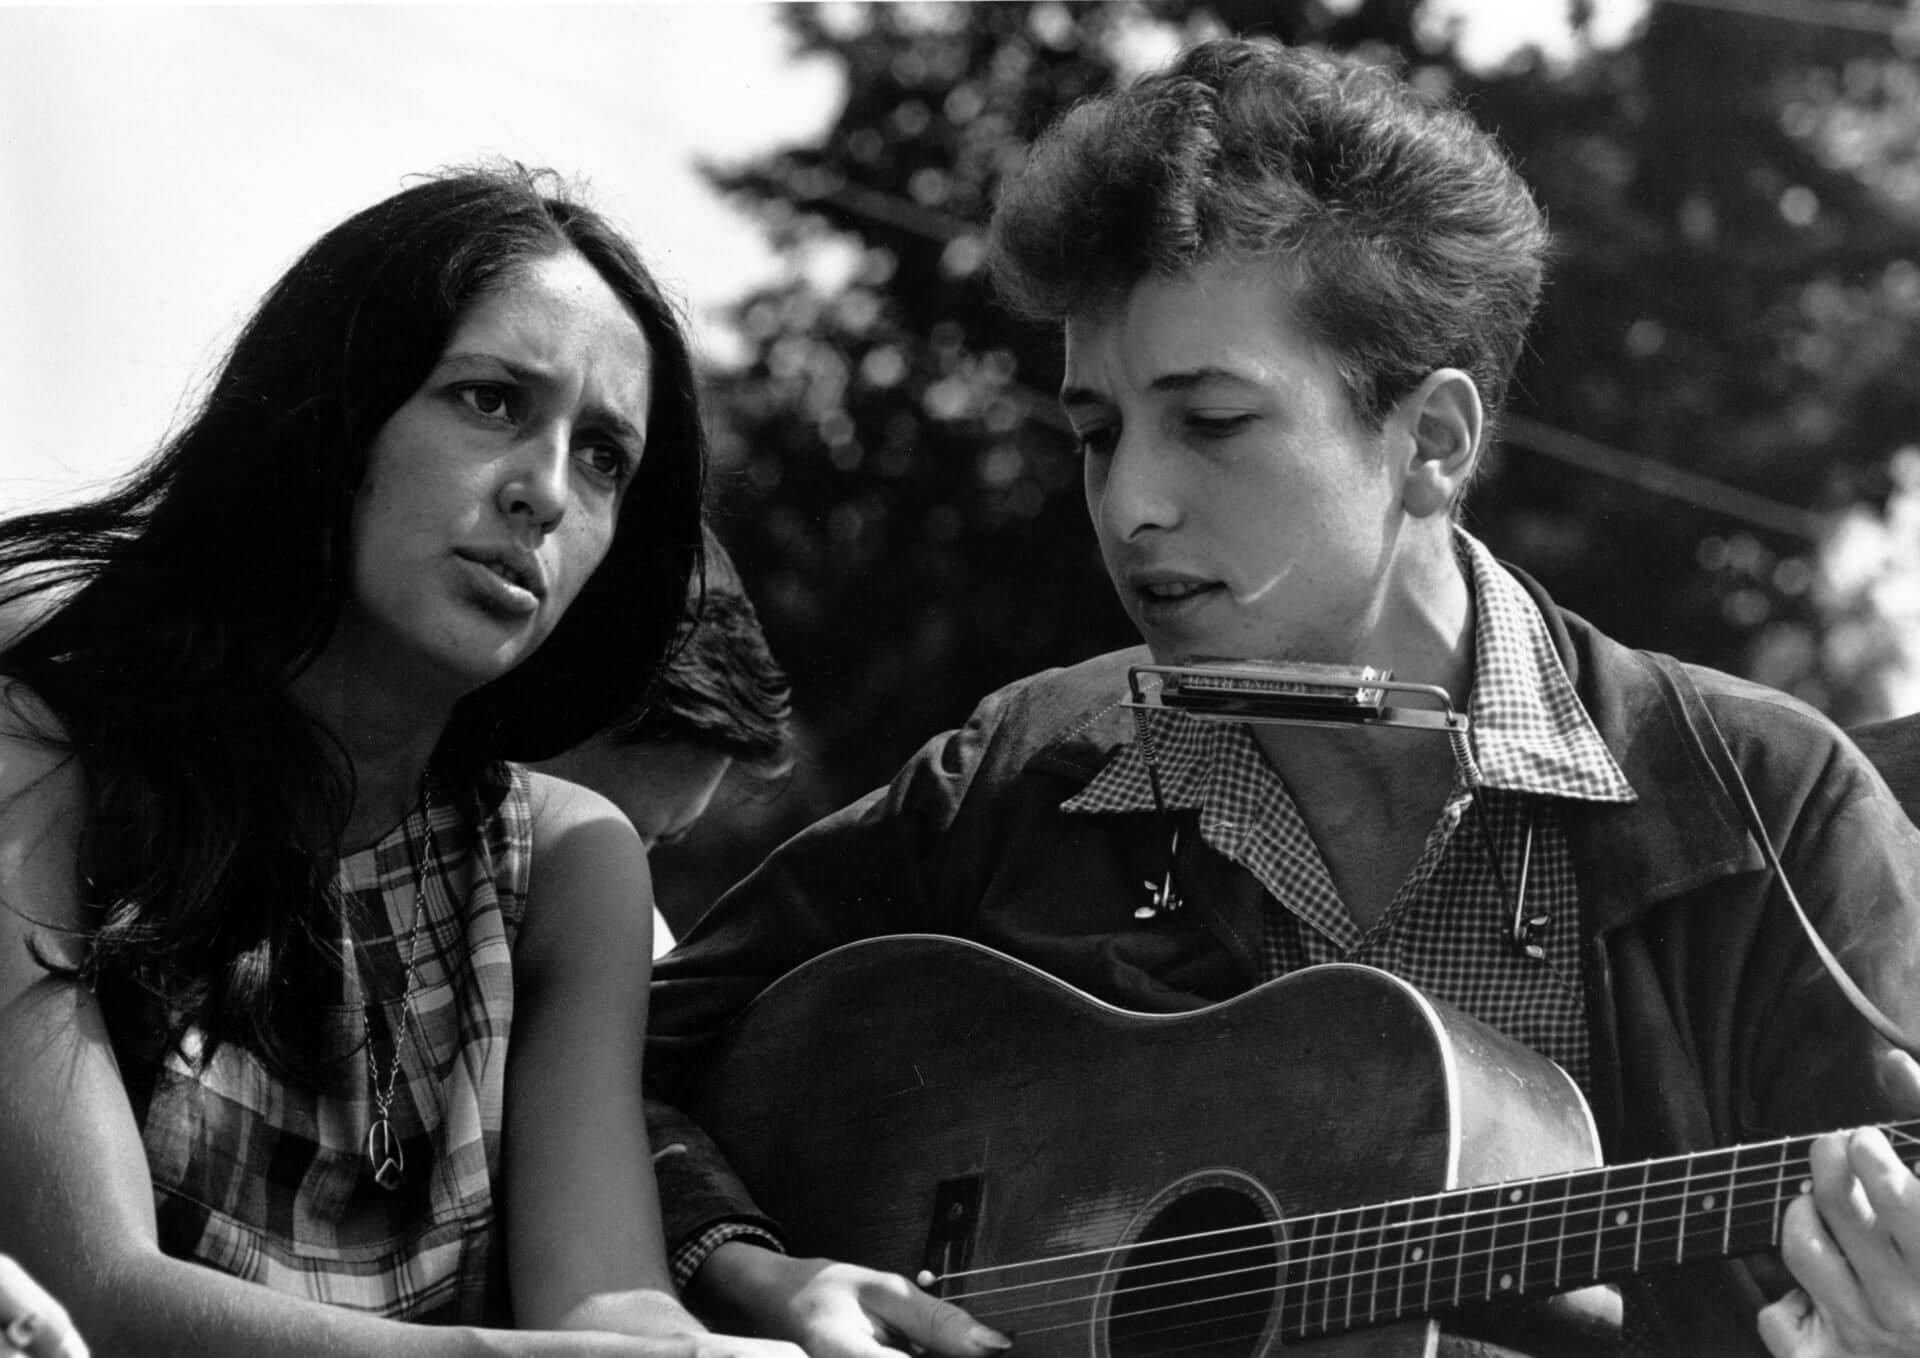 Bob Dylan iJoan Baez (fot.Rowland Scherman, Wikipedia, CC)